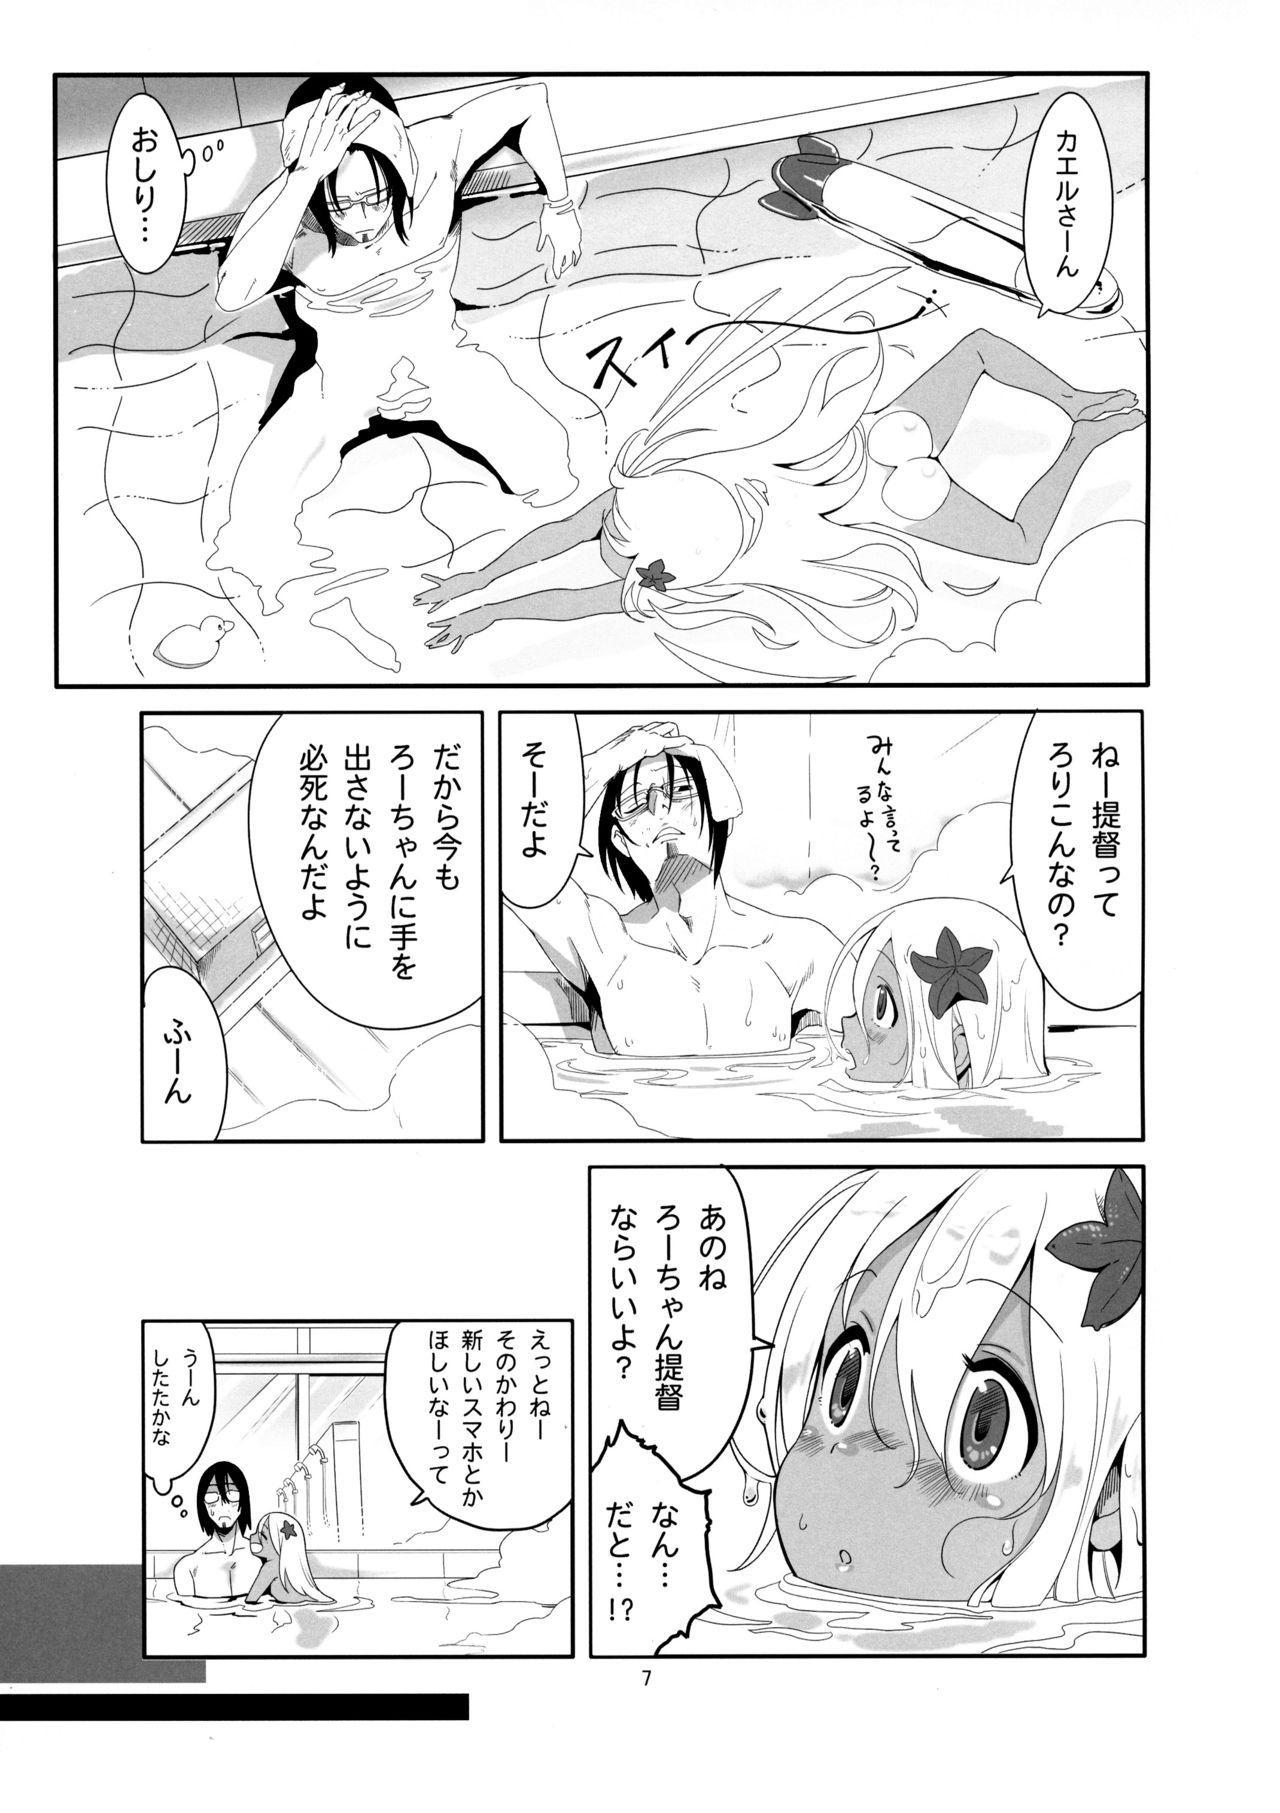 Ro-chan no Ofuro de Daisakusen 5